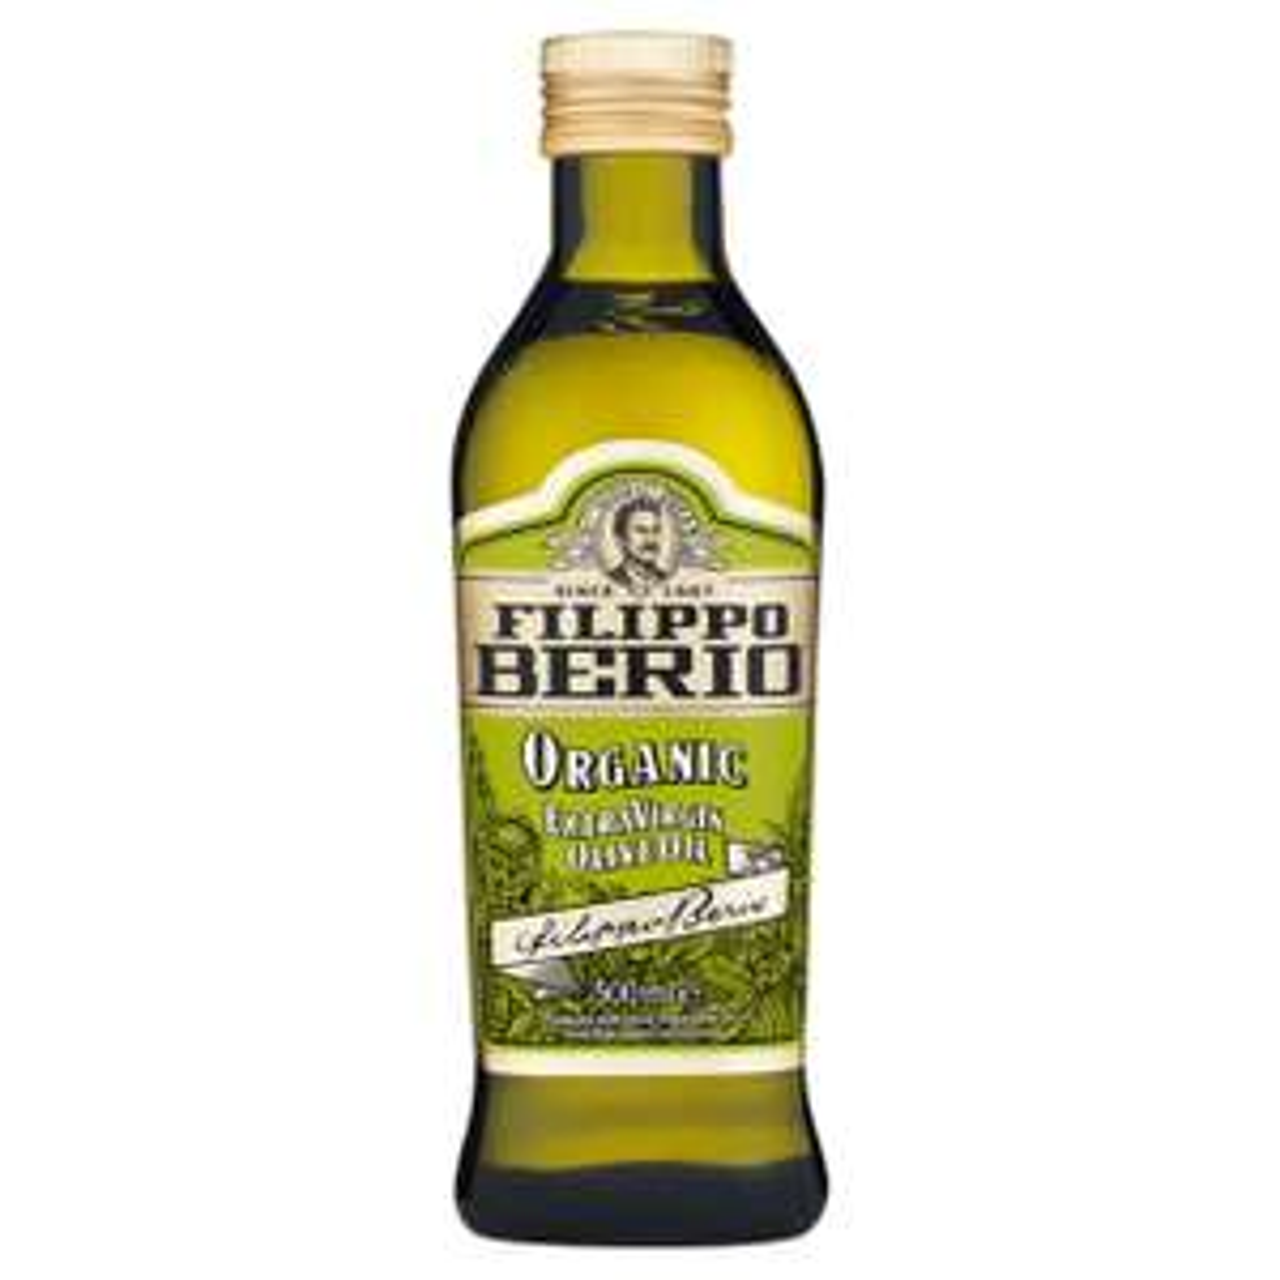 Filippo Berio Organic Extra Virgin Oil 500ml - £2.50 (Minimum Basket / Delivery Fee Applies) @ Morrisons